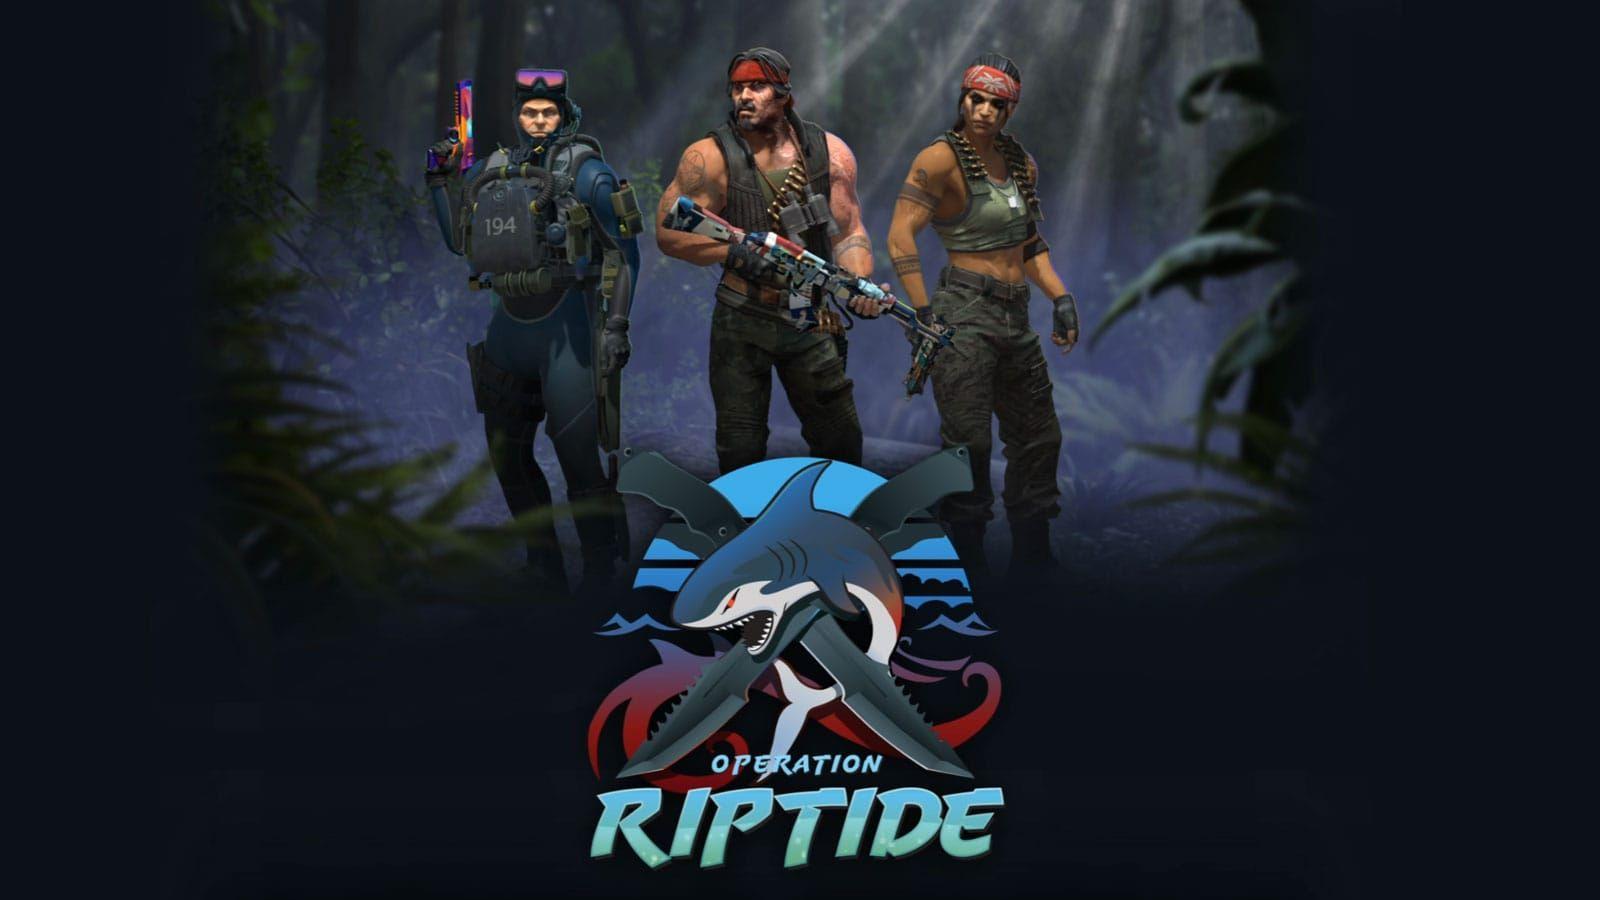 Counter-Strike: Global Offensive operation riptide logo